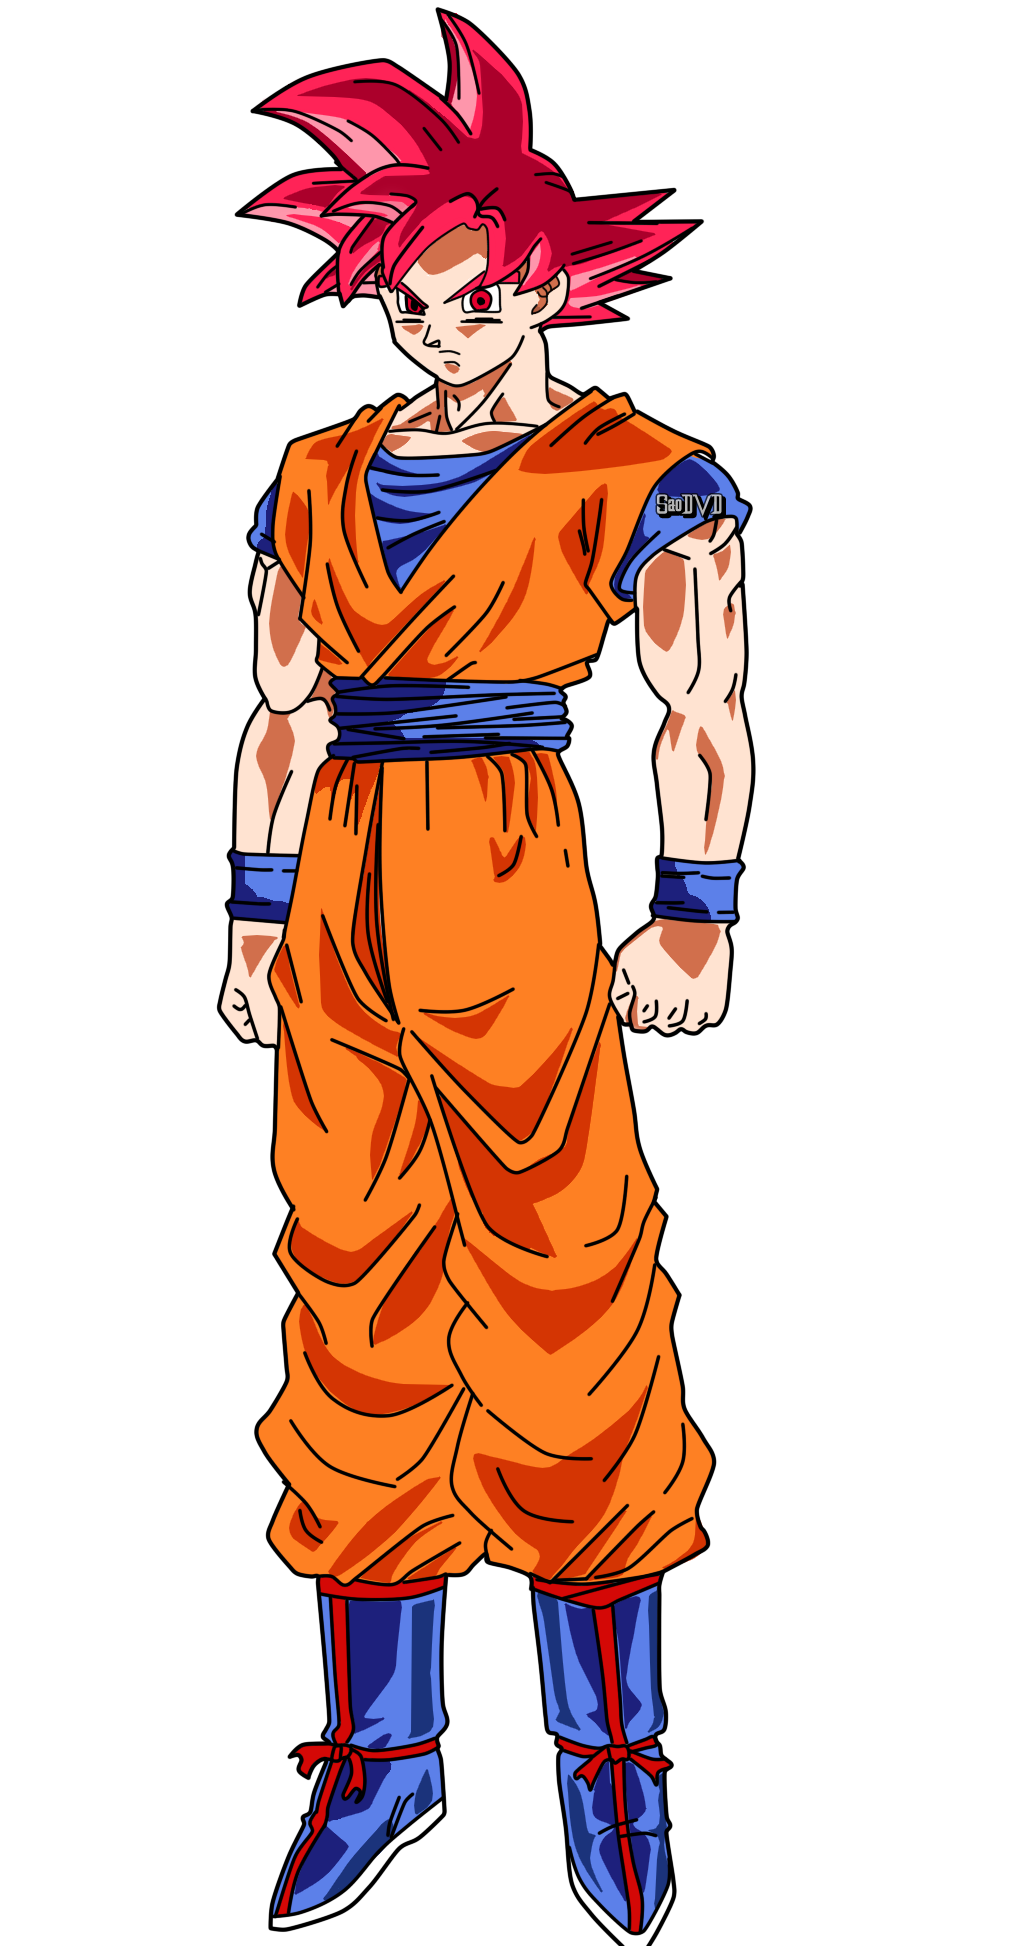 Goku SSJ God Render by SaoDVD